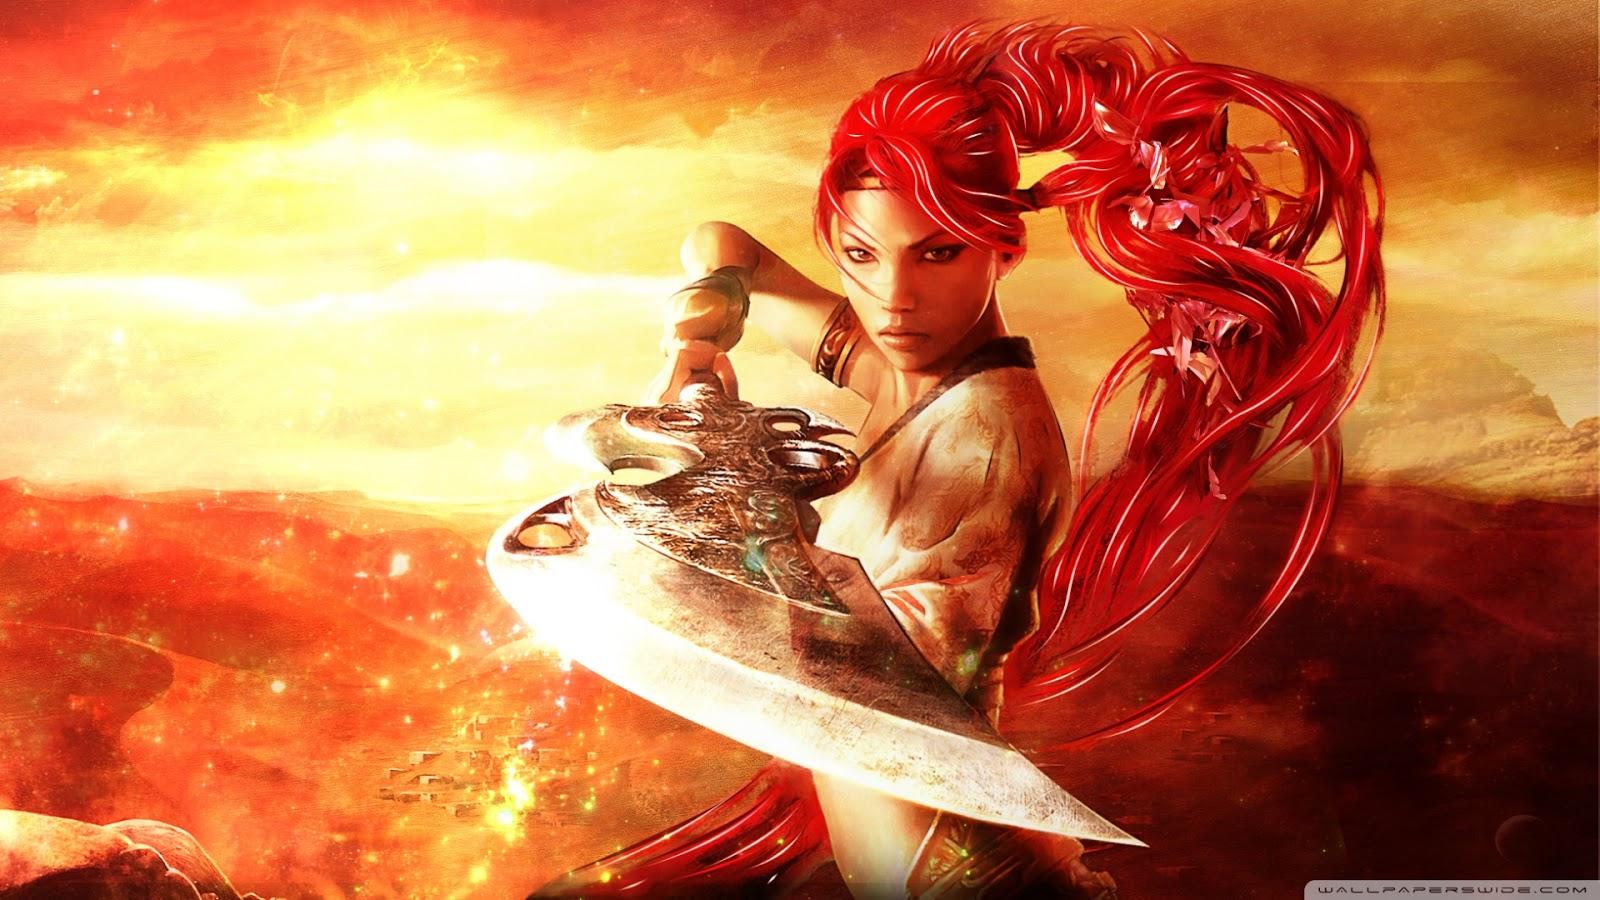 High Resolution Wallpaper | Heavenly Sword 1600x900 px